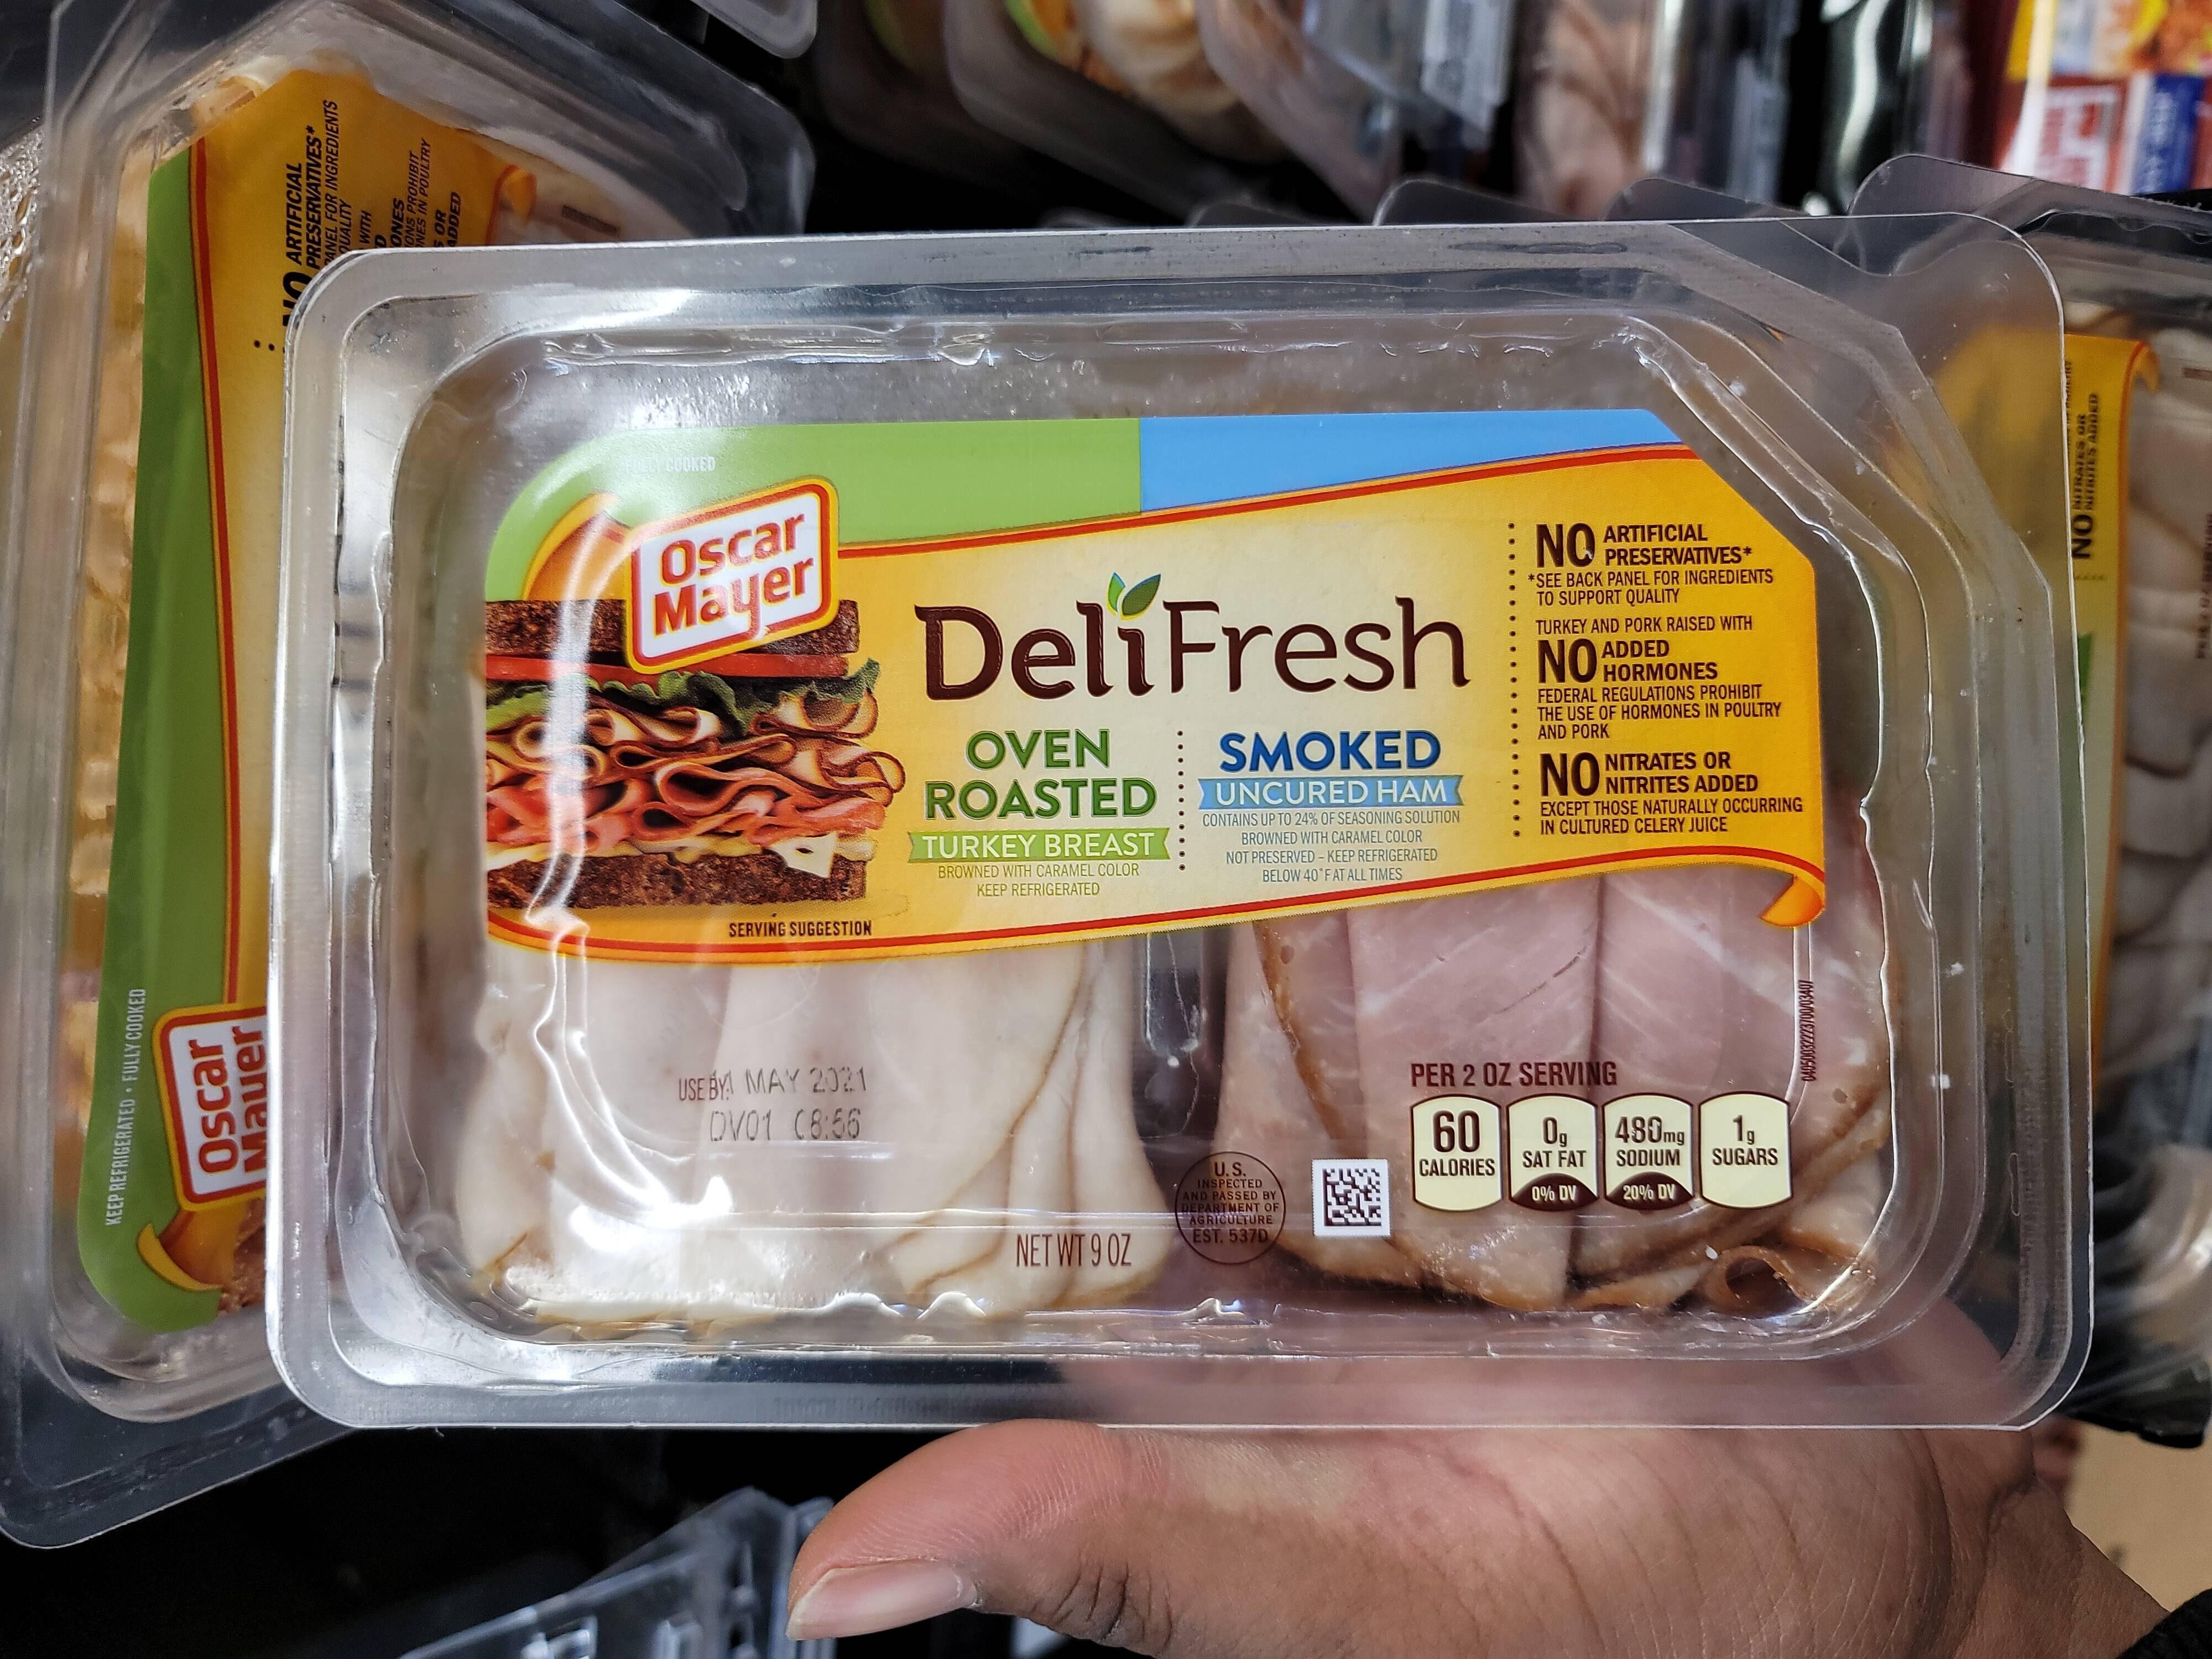 Oven roasted turkey breast, smoked uncured ham - Prodotto - en